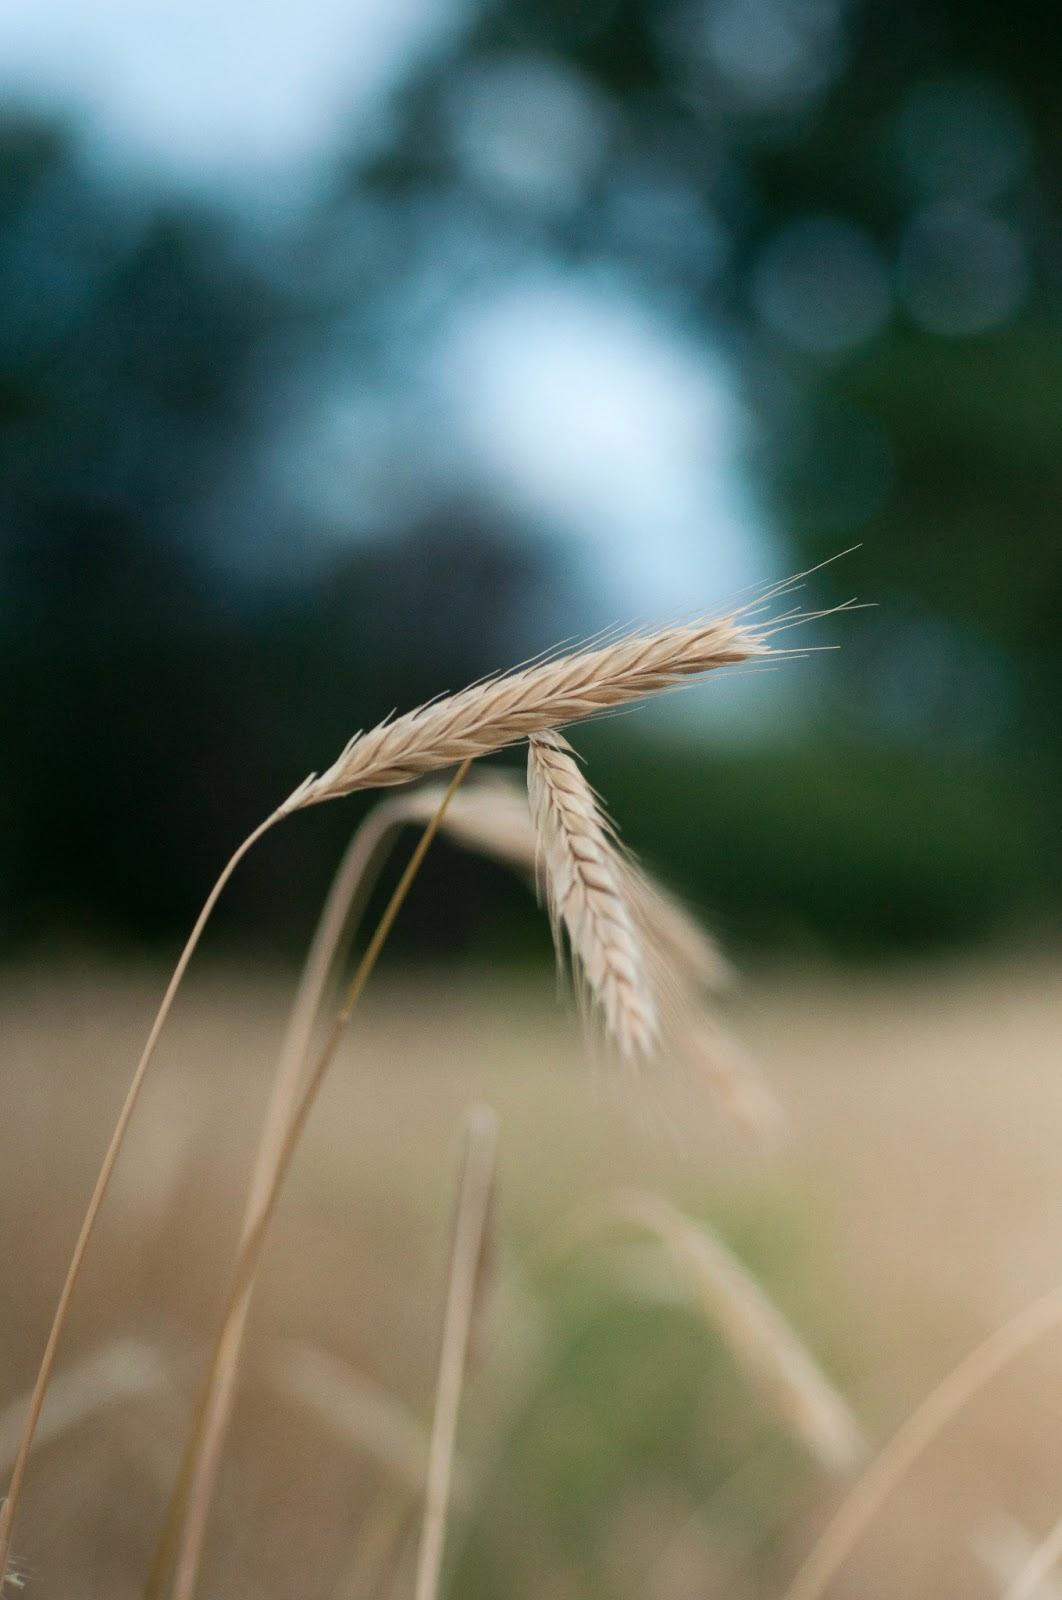 grain, weeds, utah,  scenery, utah outdoors